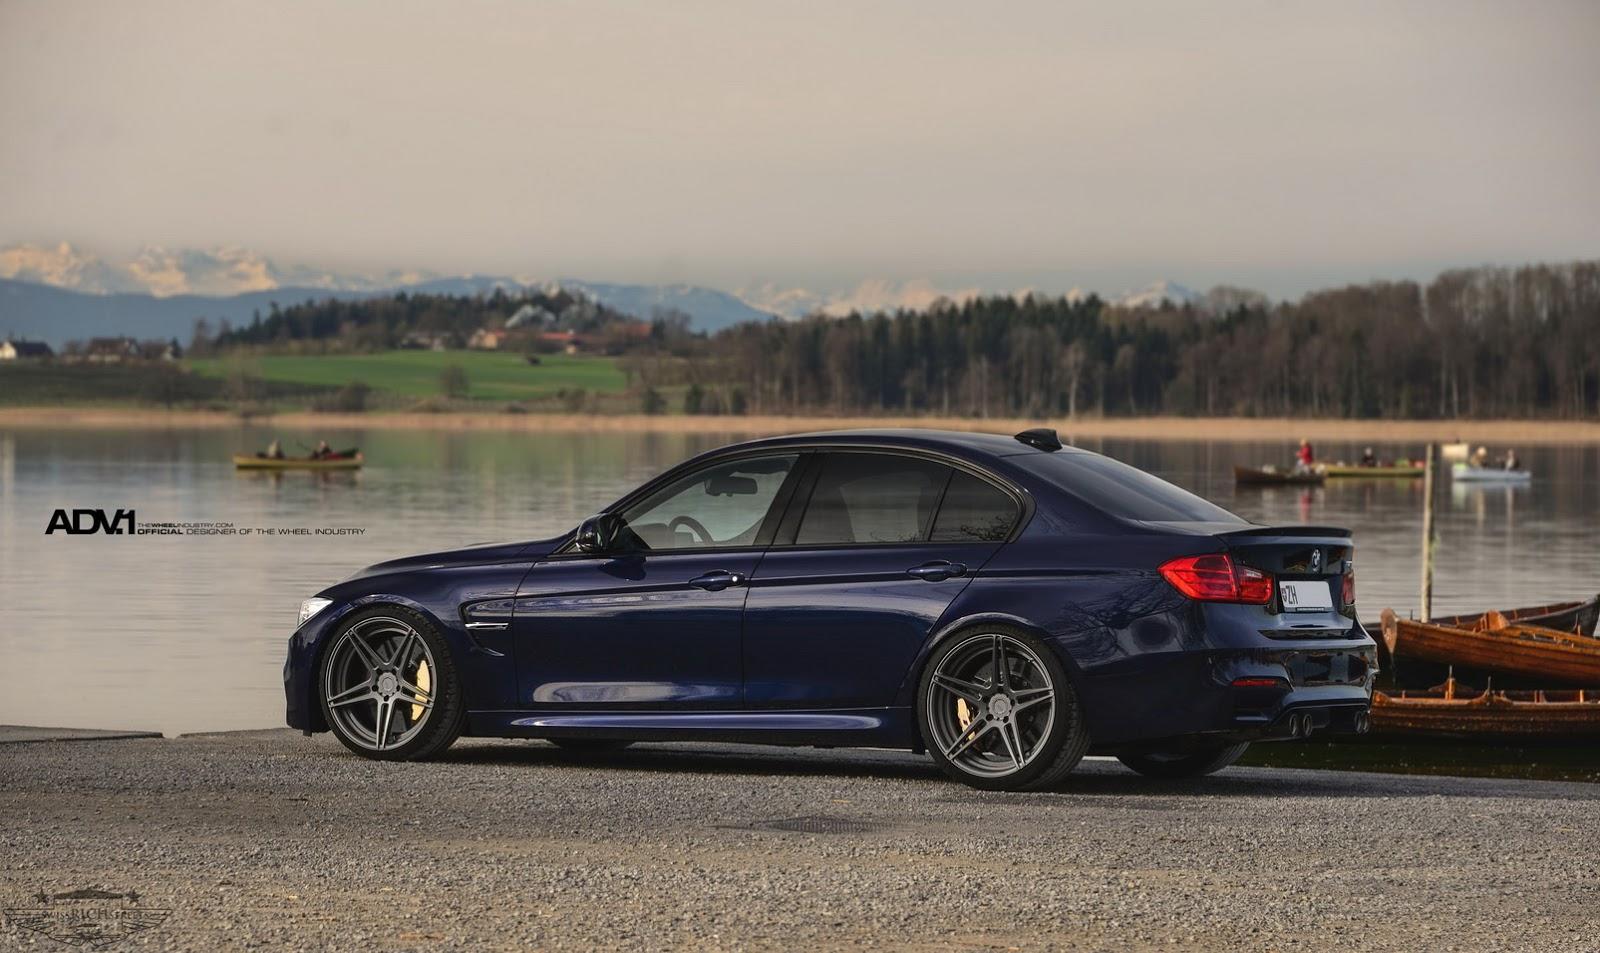 BMW M3 ADV Wheels